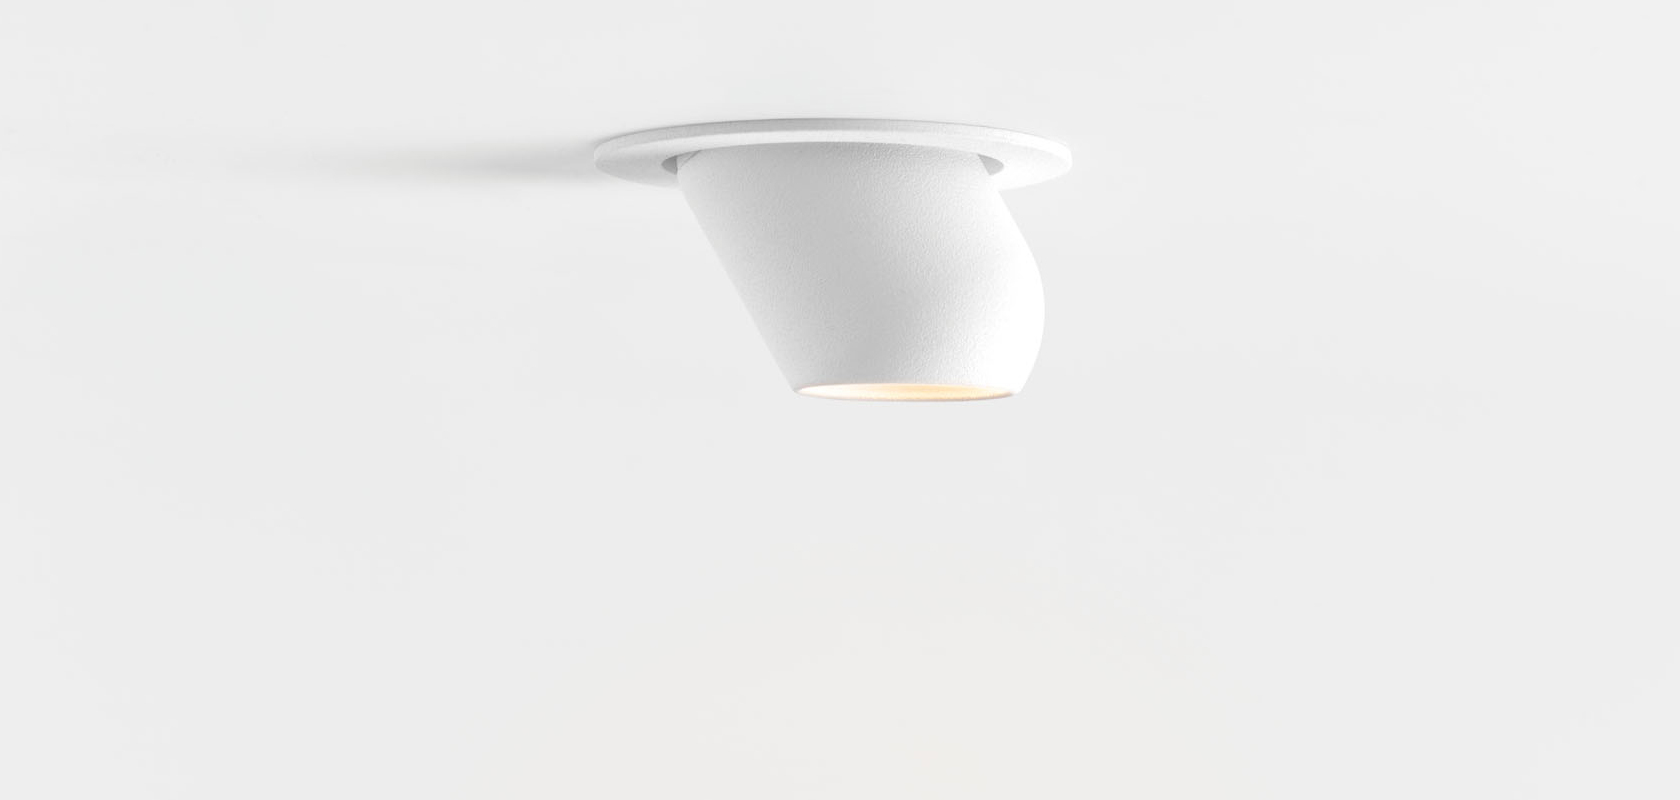 Faux Plafond Cuisine Spot Led spot led semi-encastrée orientable pupilmodular lighting